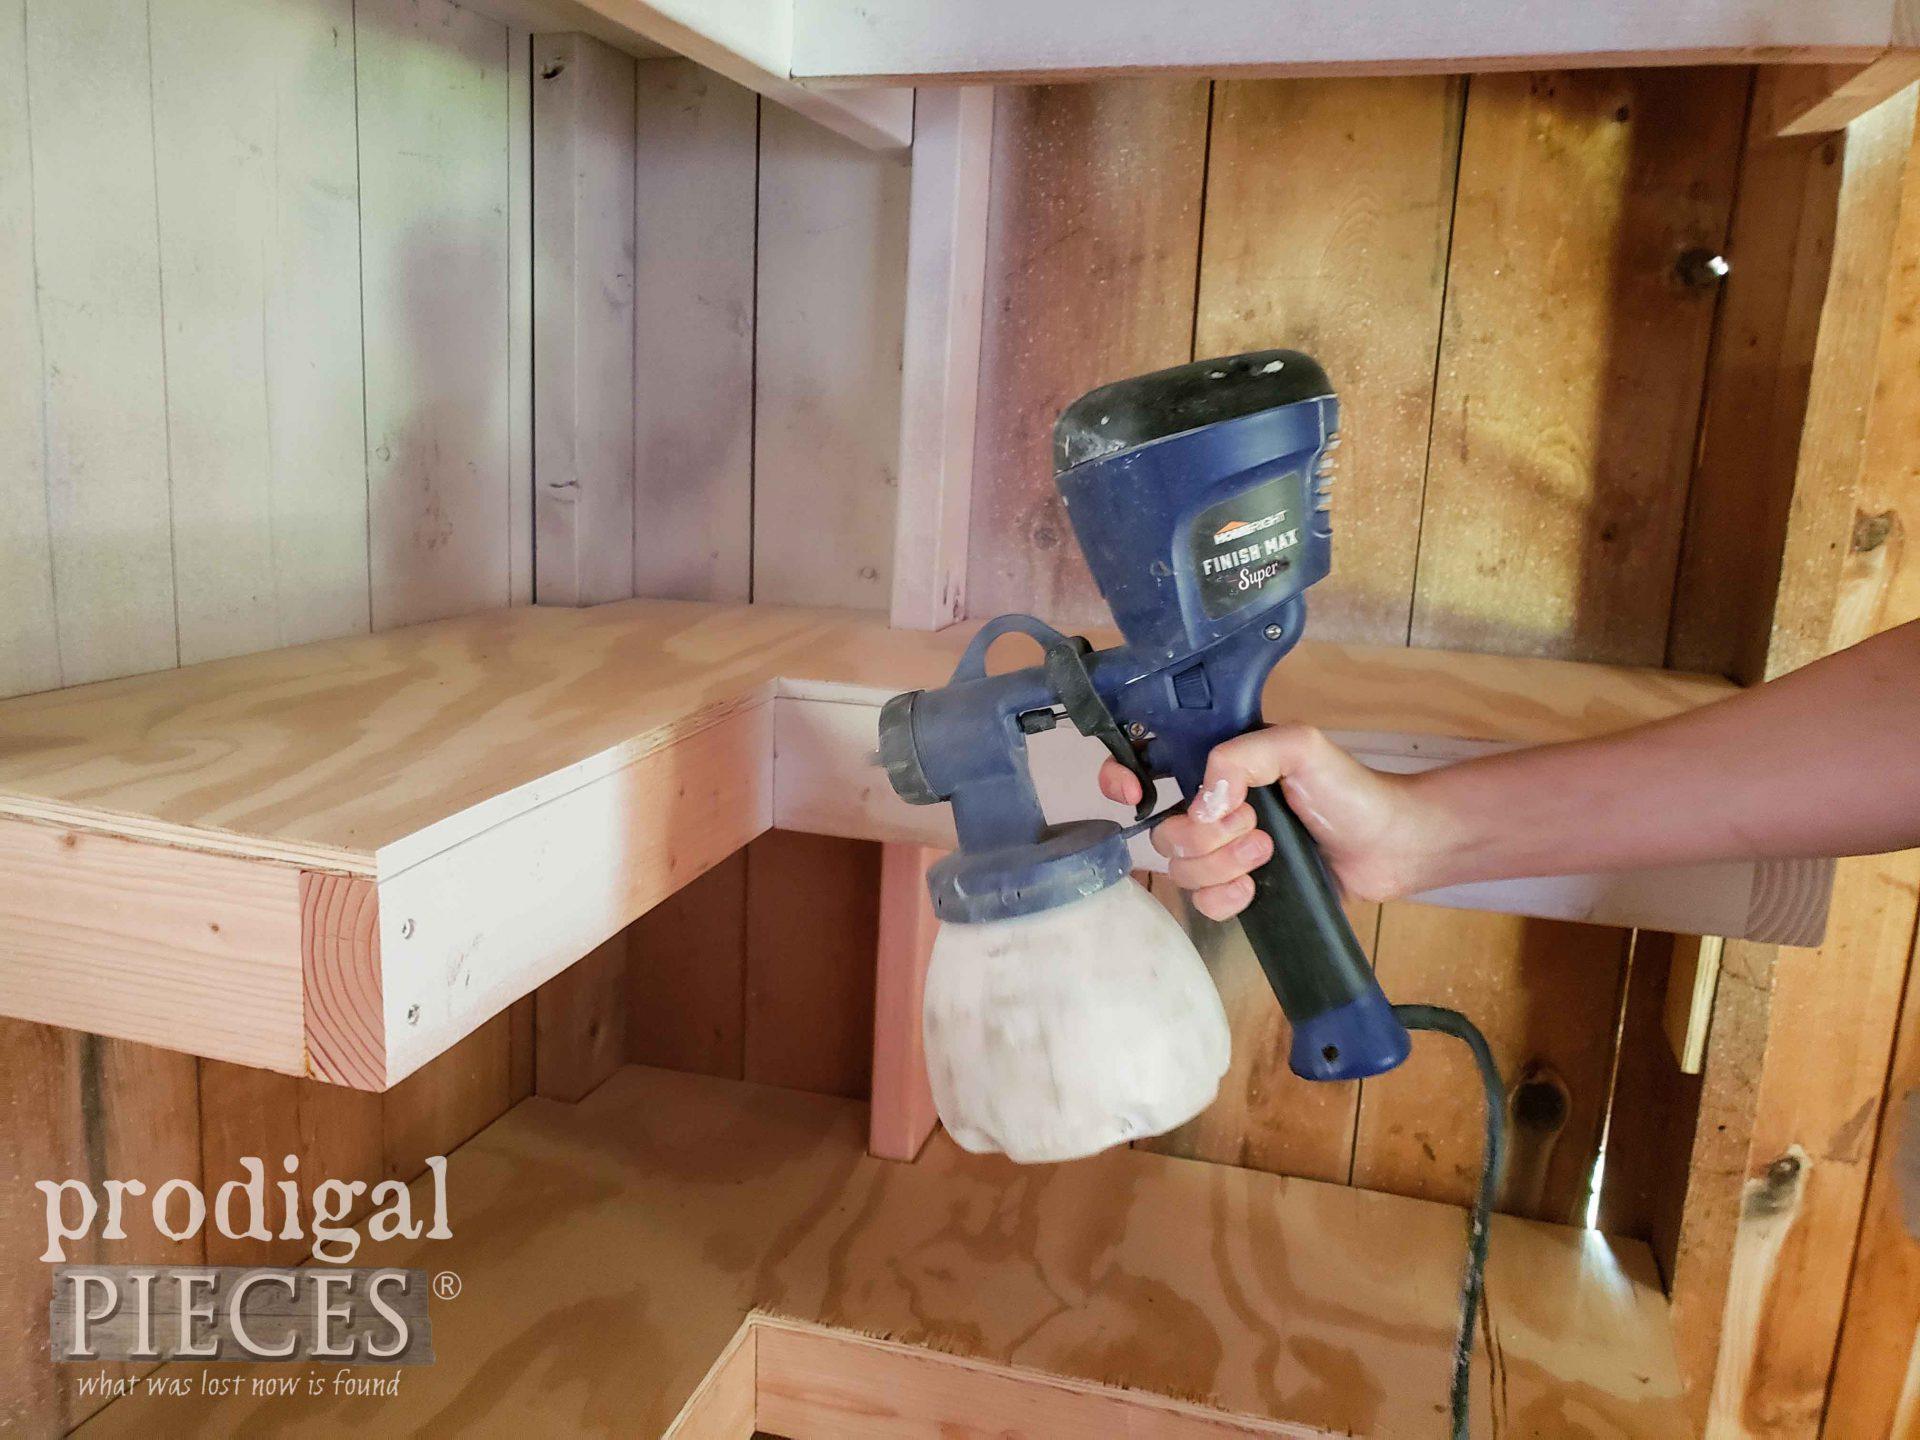 Spraying Shed Shelves with HomeRight Super Finish Max Extra Sprayer | prodigalpieces.com #prodigalpieces